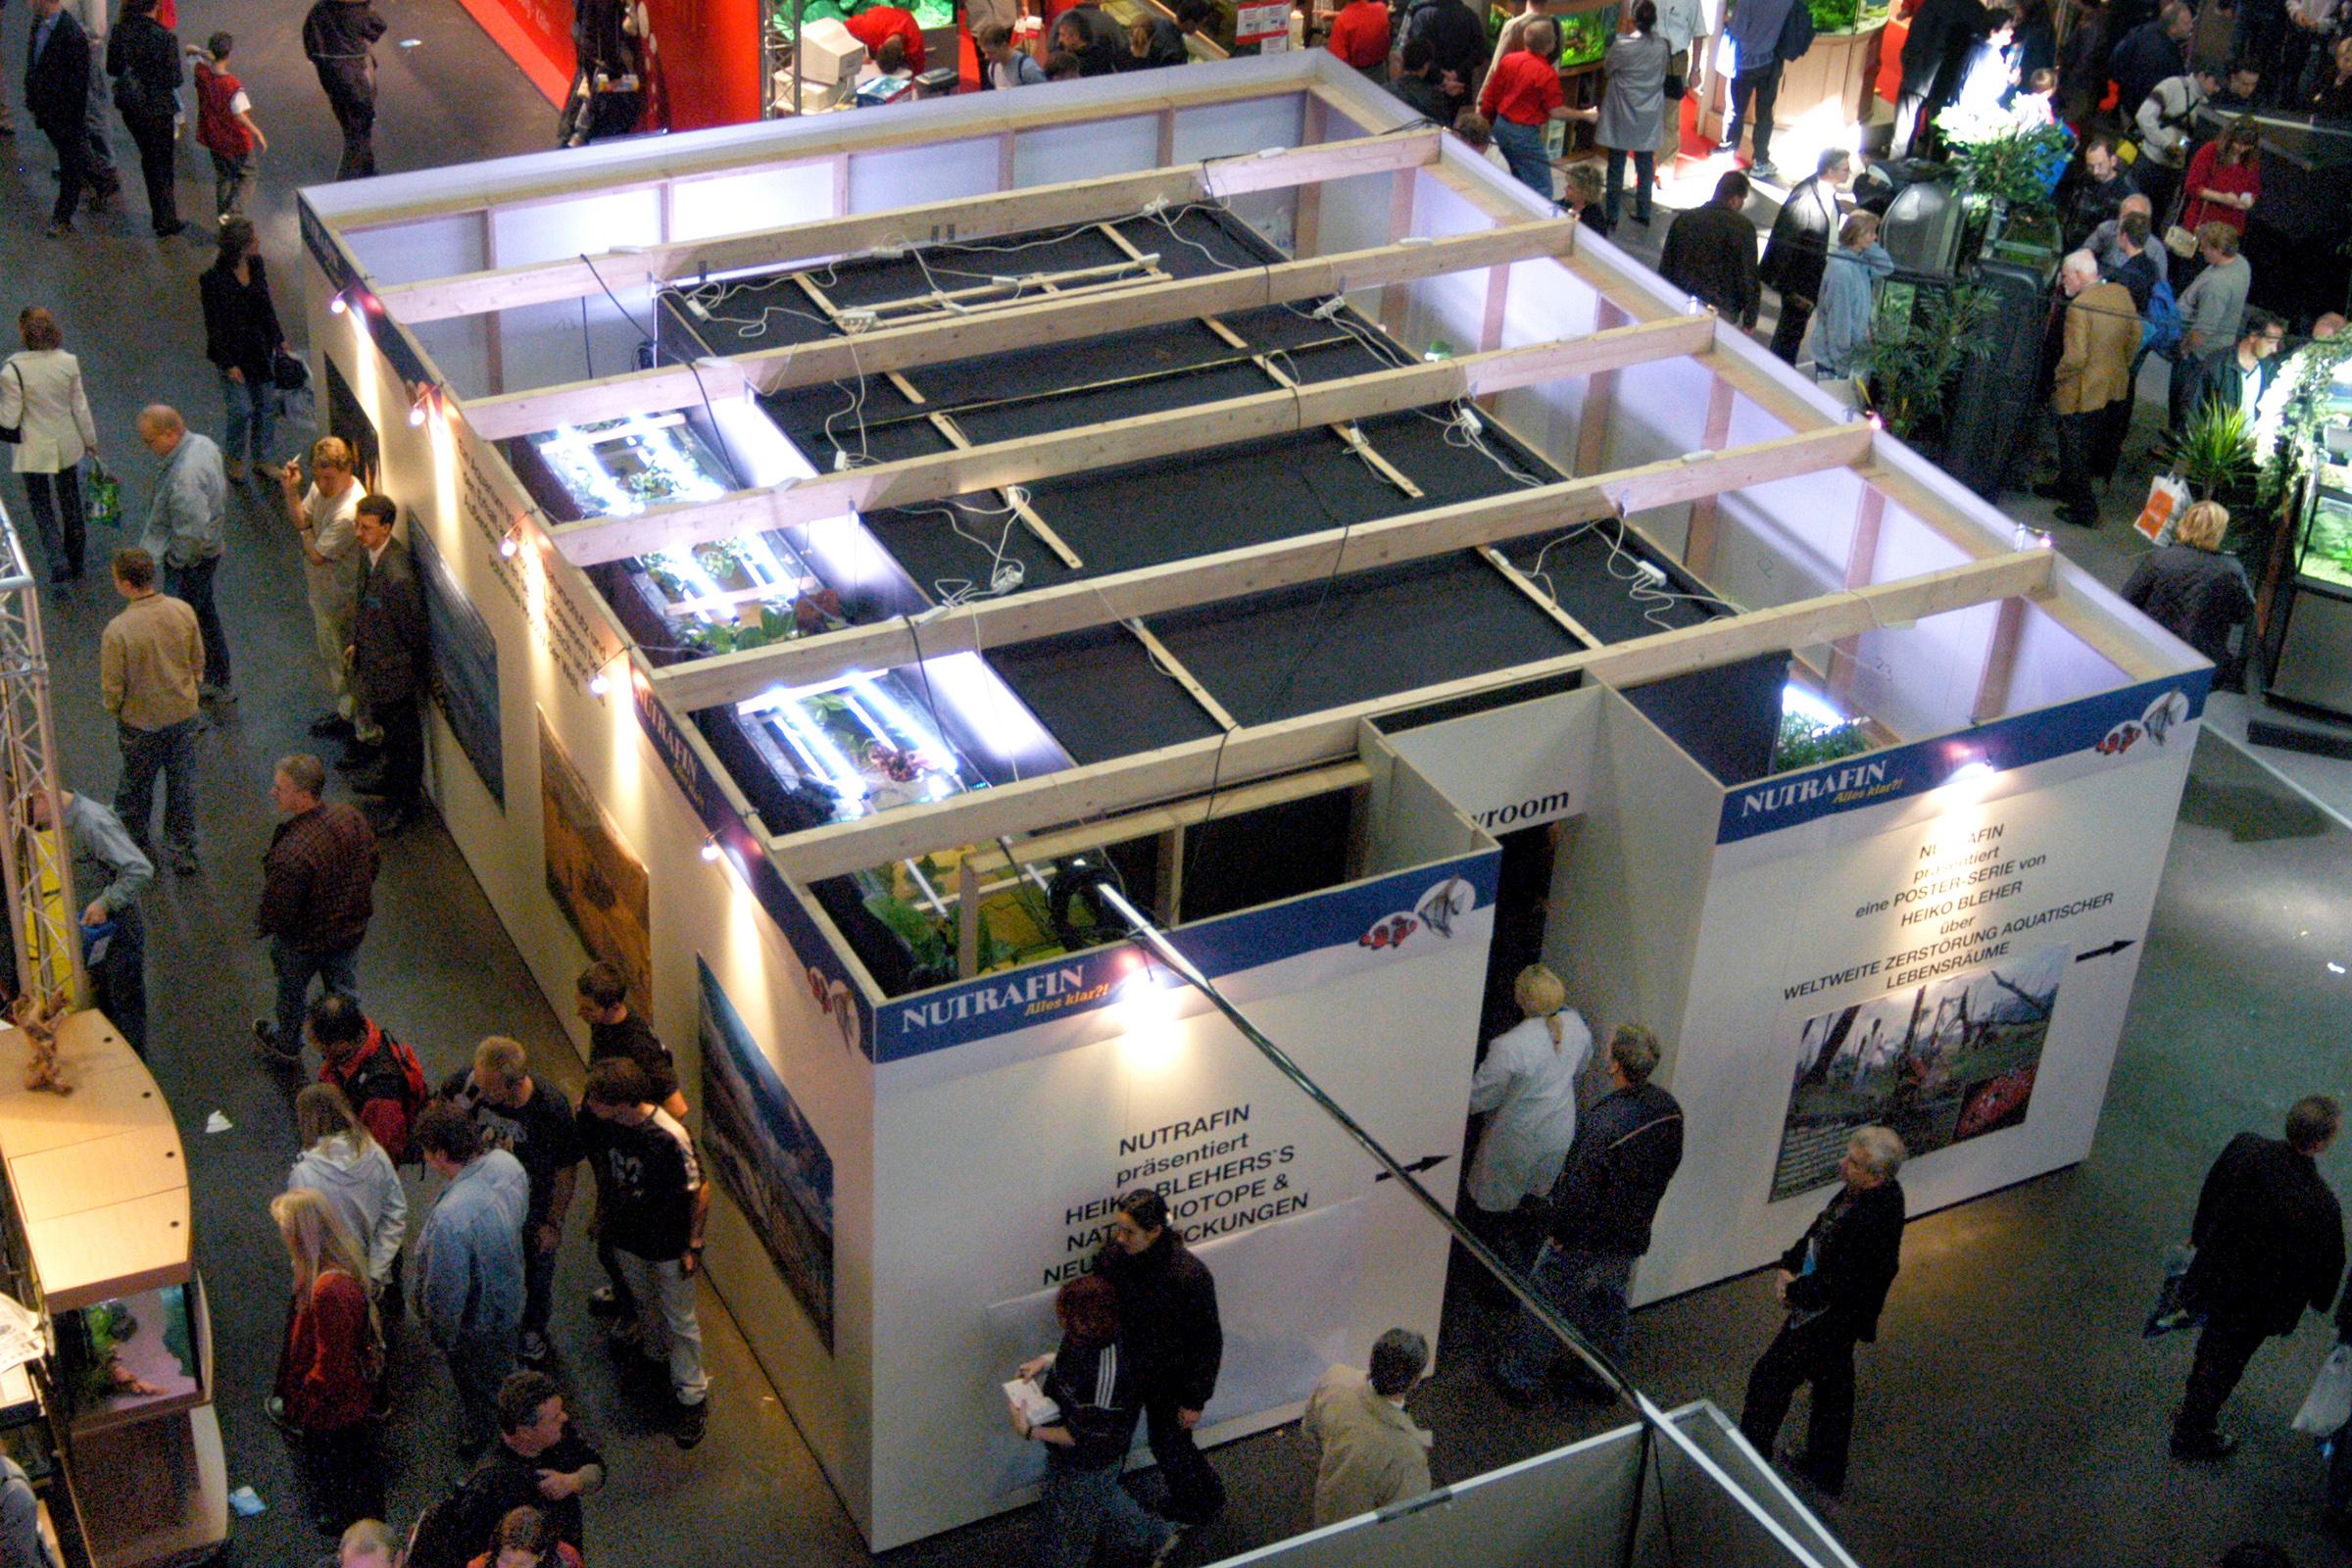 Biotope aquarium stand in Germany 2001. ©BAP, photo N. Khardina